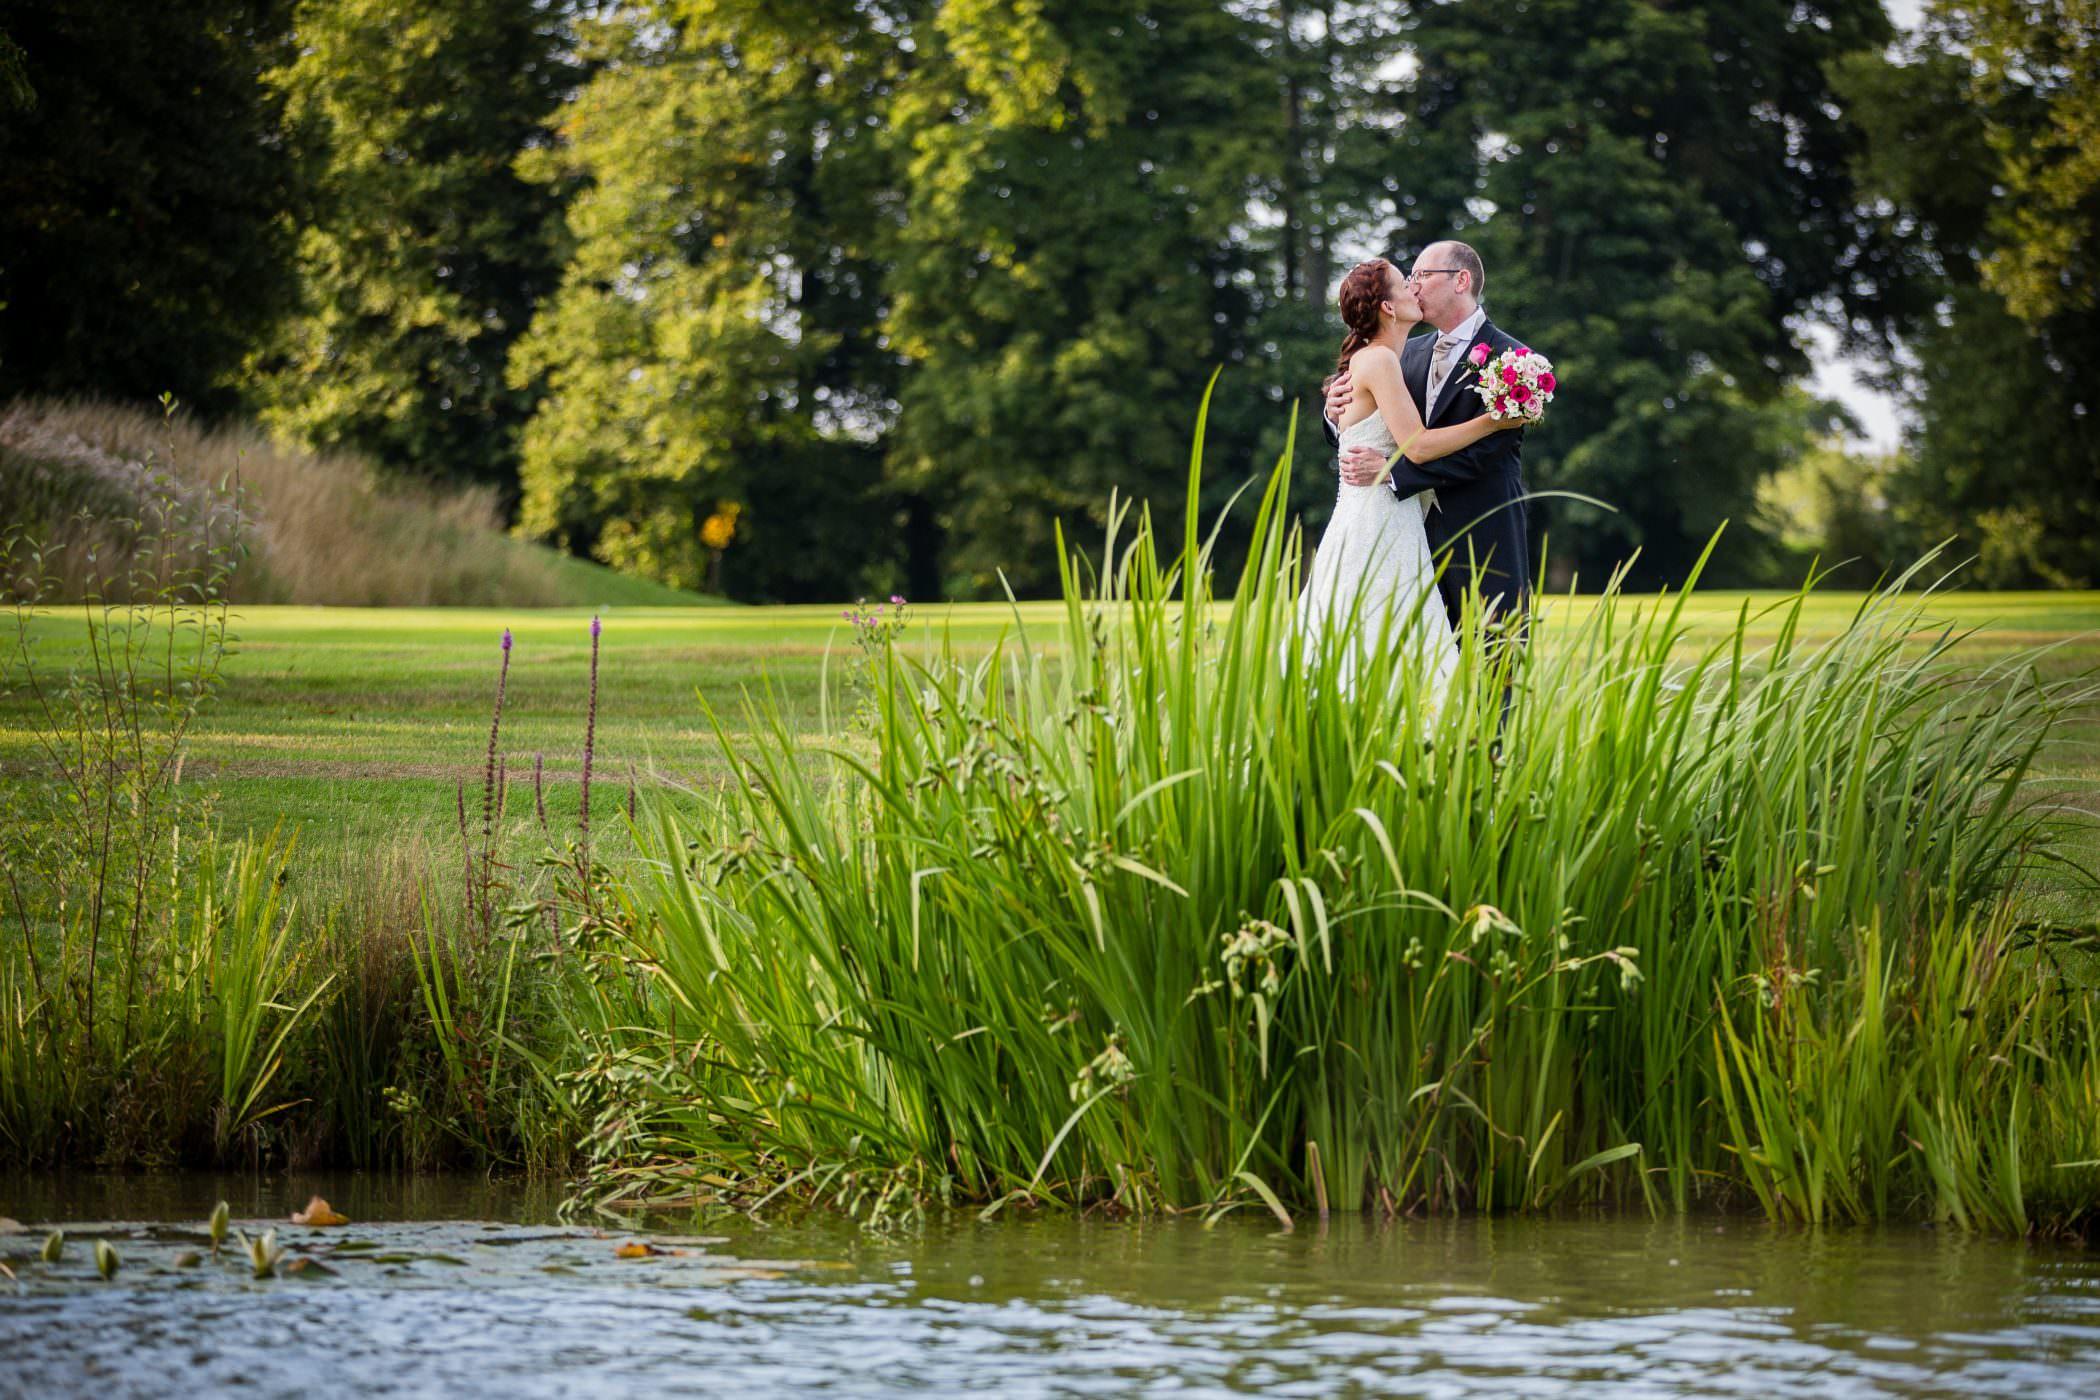 Malcolm & Ela's wedding at Badgemore Park Golf Club